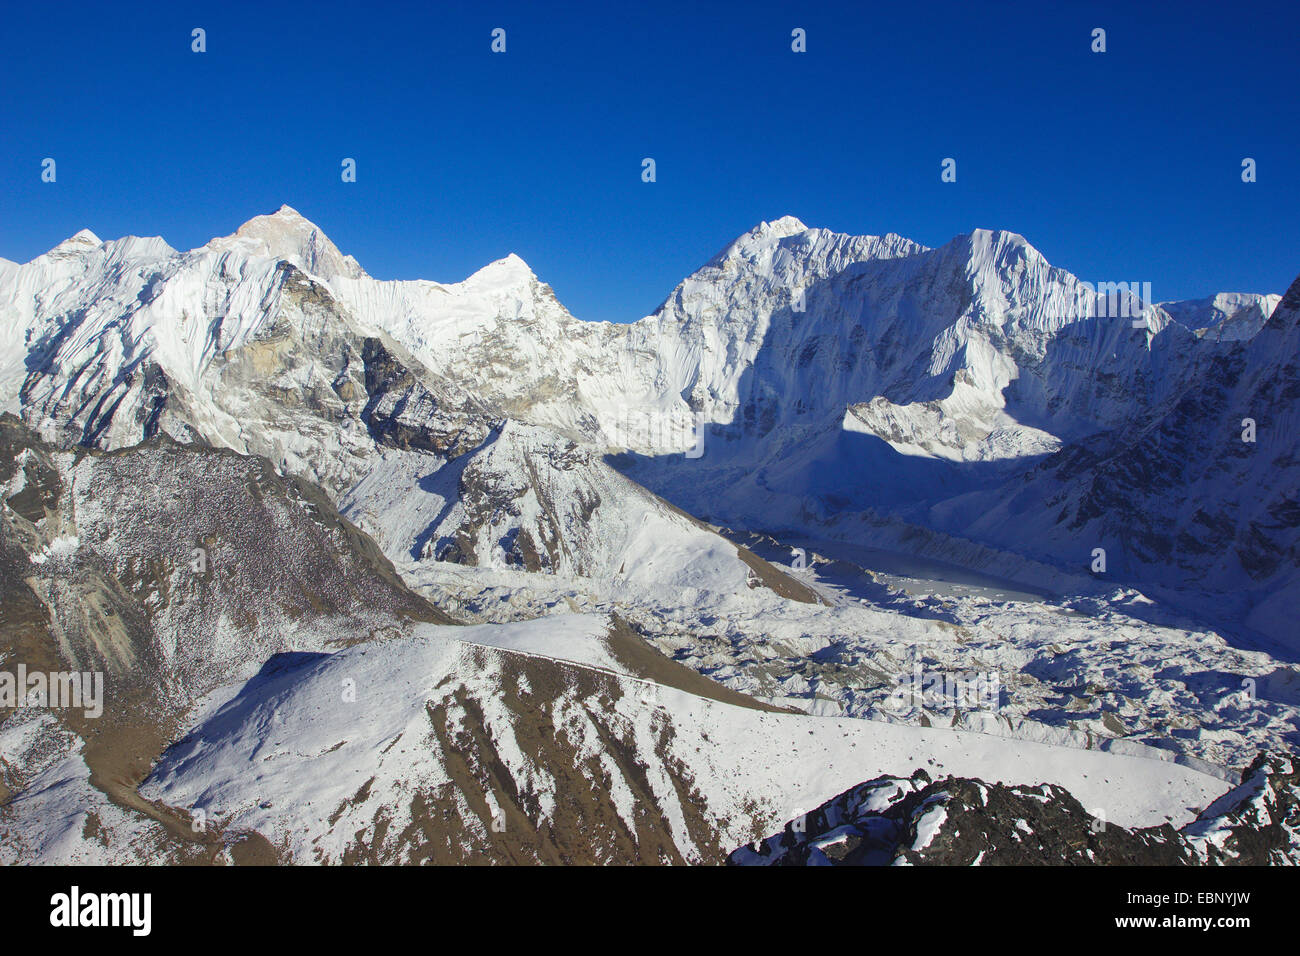 view from Chhukhung Ri to Island Peak, Num Ri and Baruntse, Nepal, Himalaya, Khumbu Himal - Stock Image